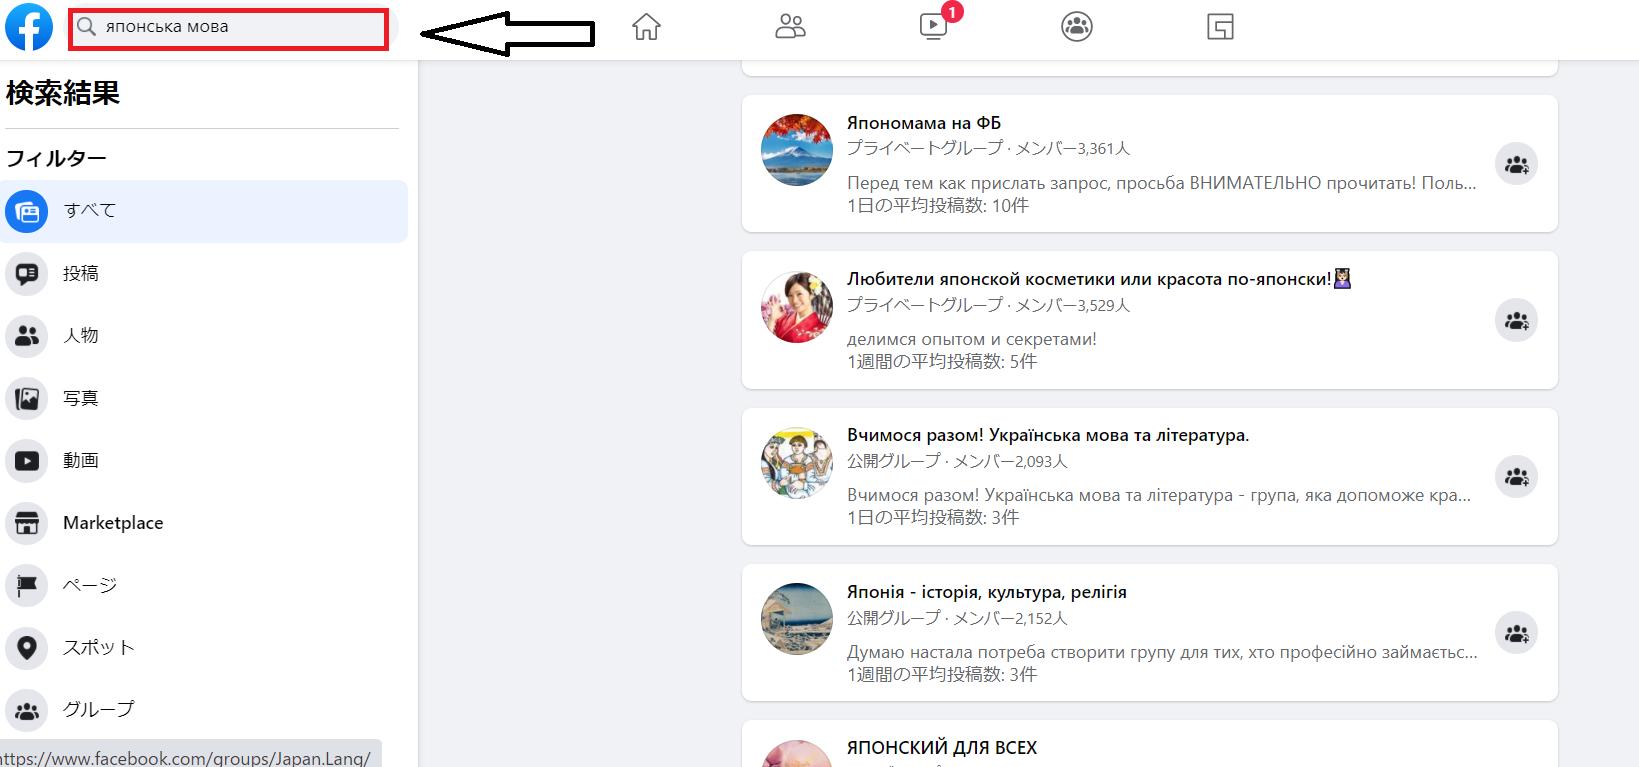 ukrainian_people_on_the_facebook